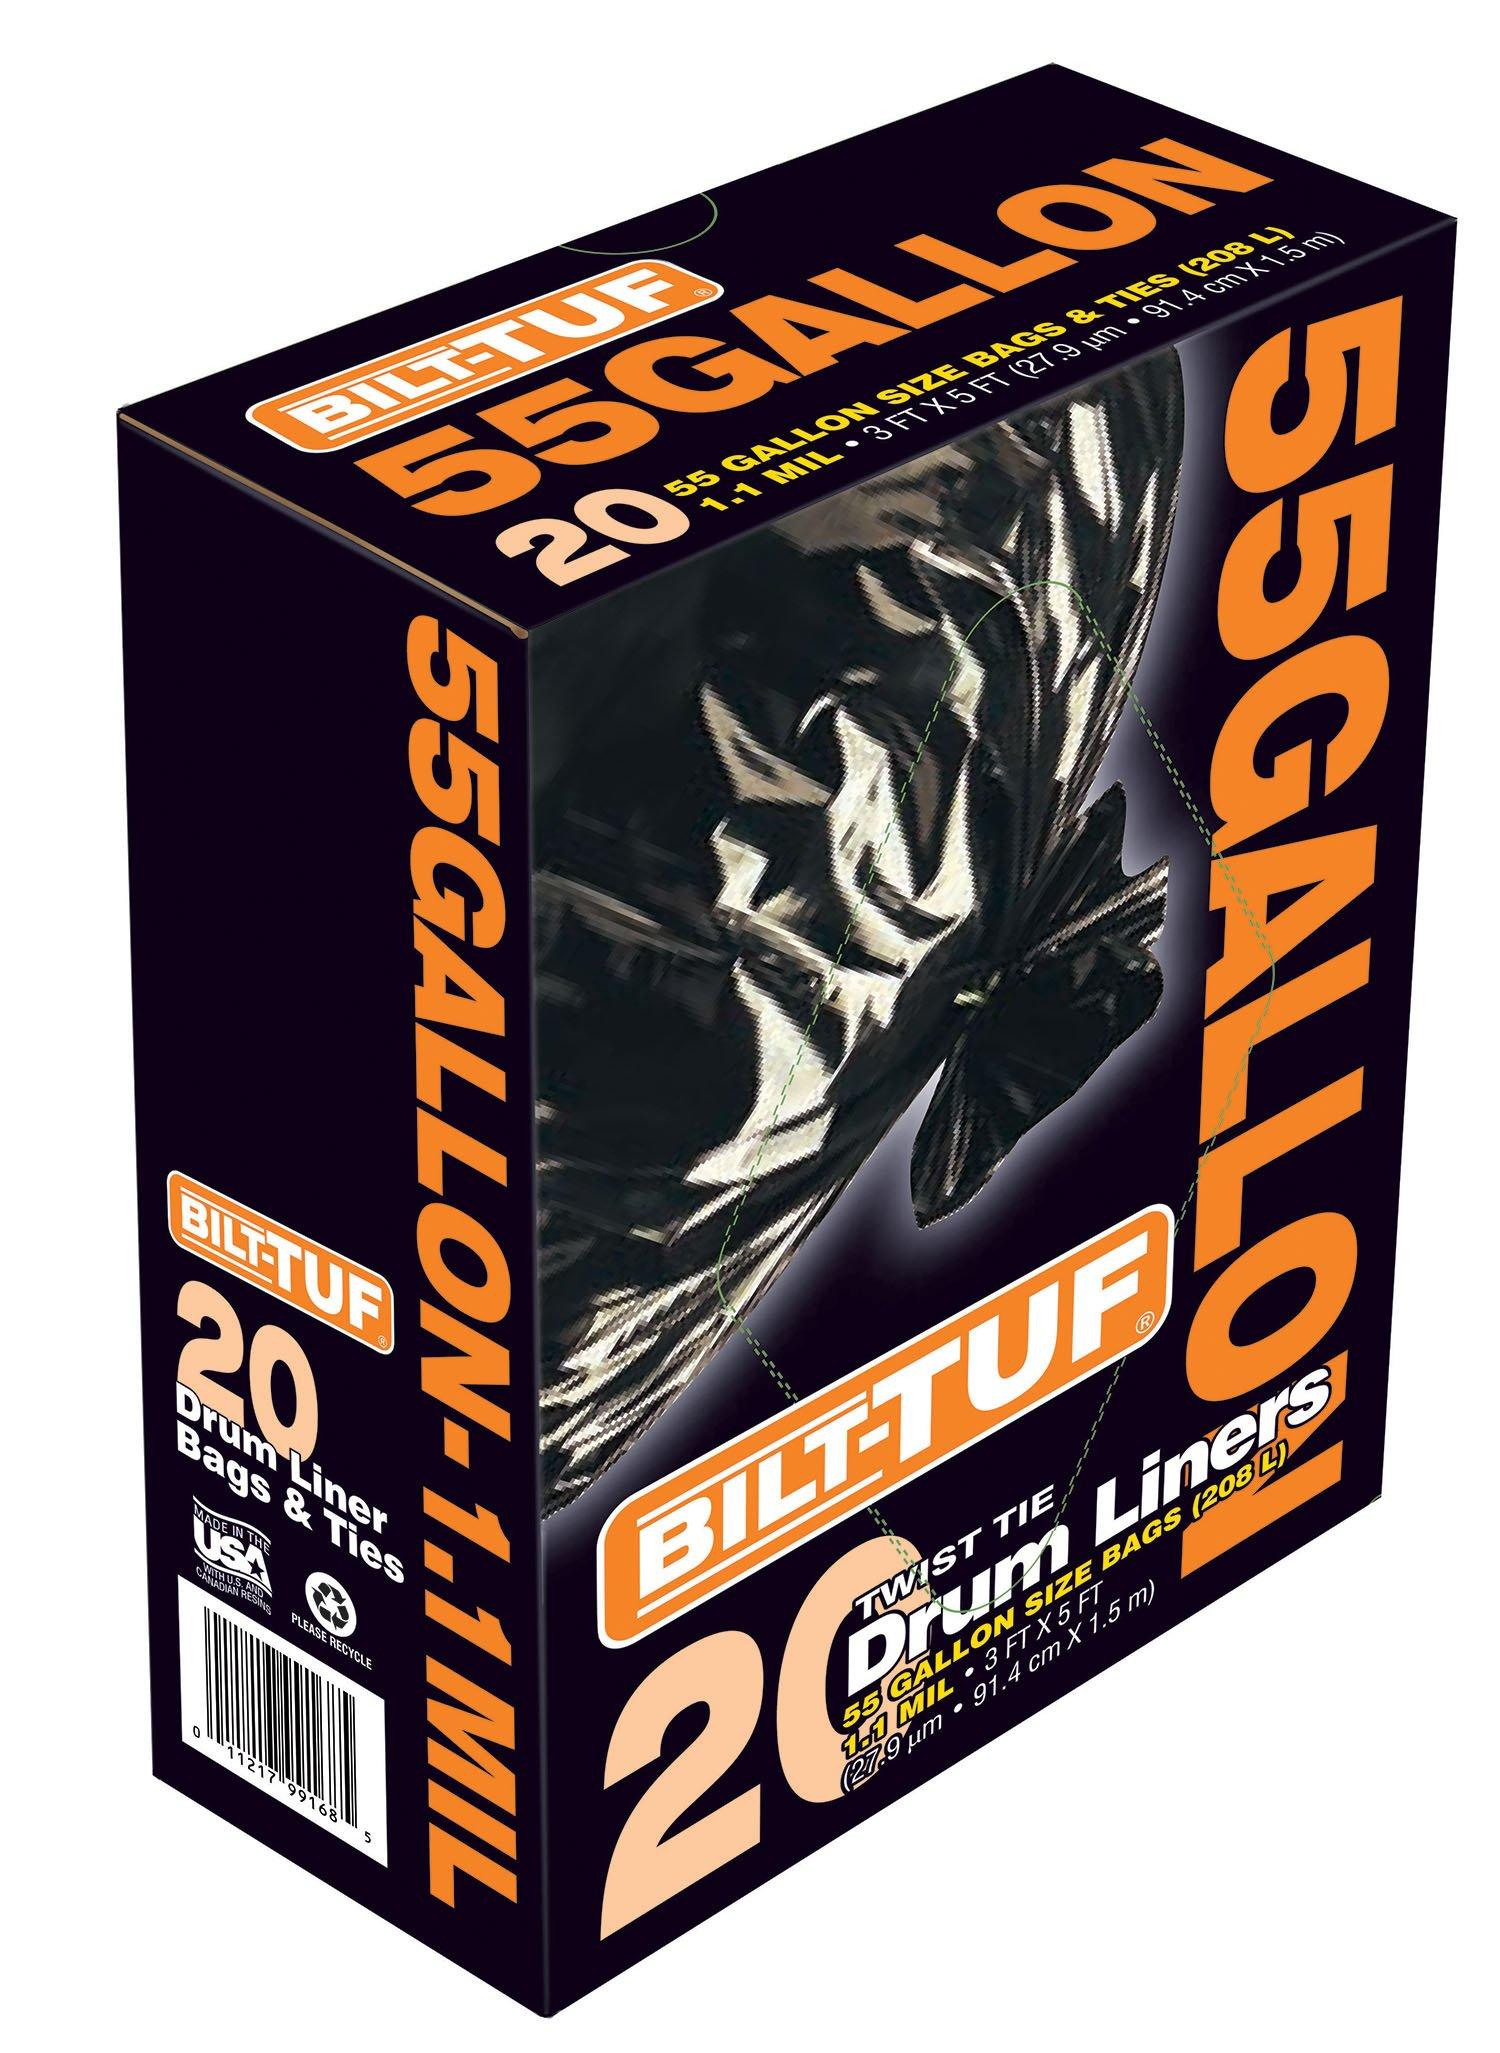 Presto Products Trash Bags 55 Gallon Drum Liner Garbage Bags Twist Tie Black 55 Gallon 1.1 Mil 20 Count - Bilt-Tuf